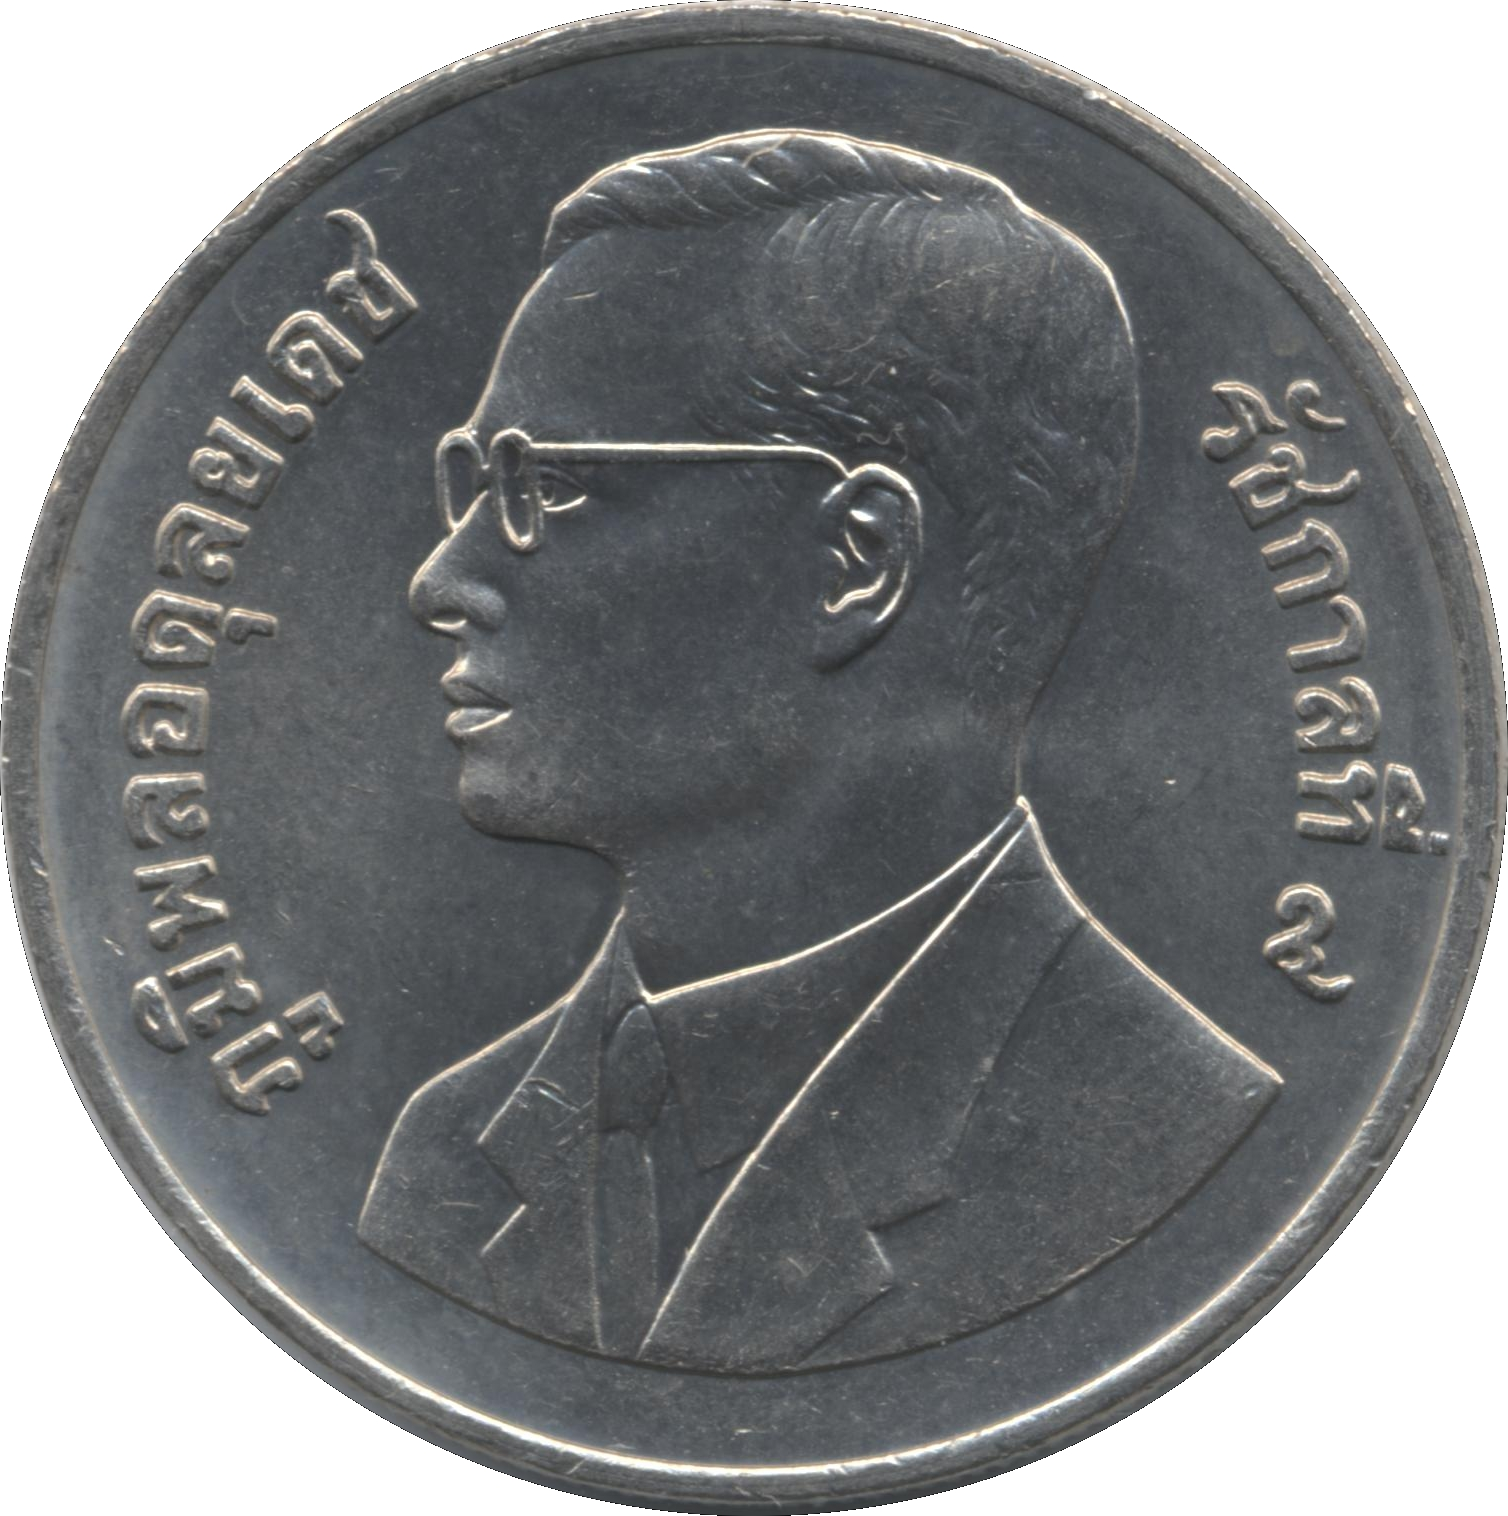 20 BAHT UNC COIN 2000 YEAR Y#376 RAMA IX THAILAND